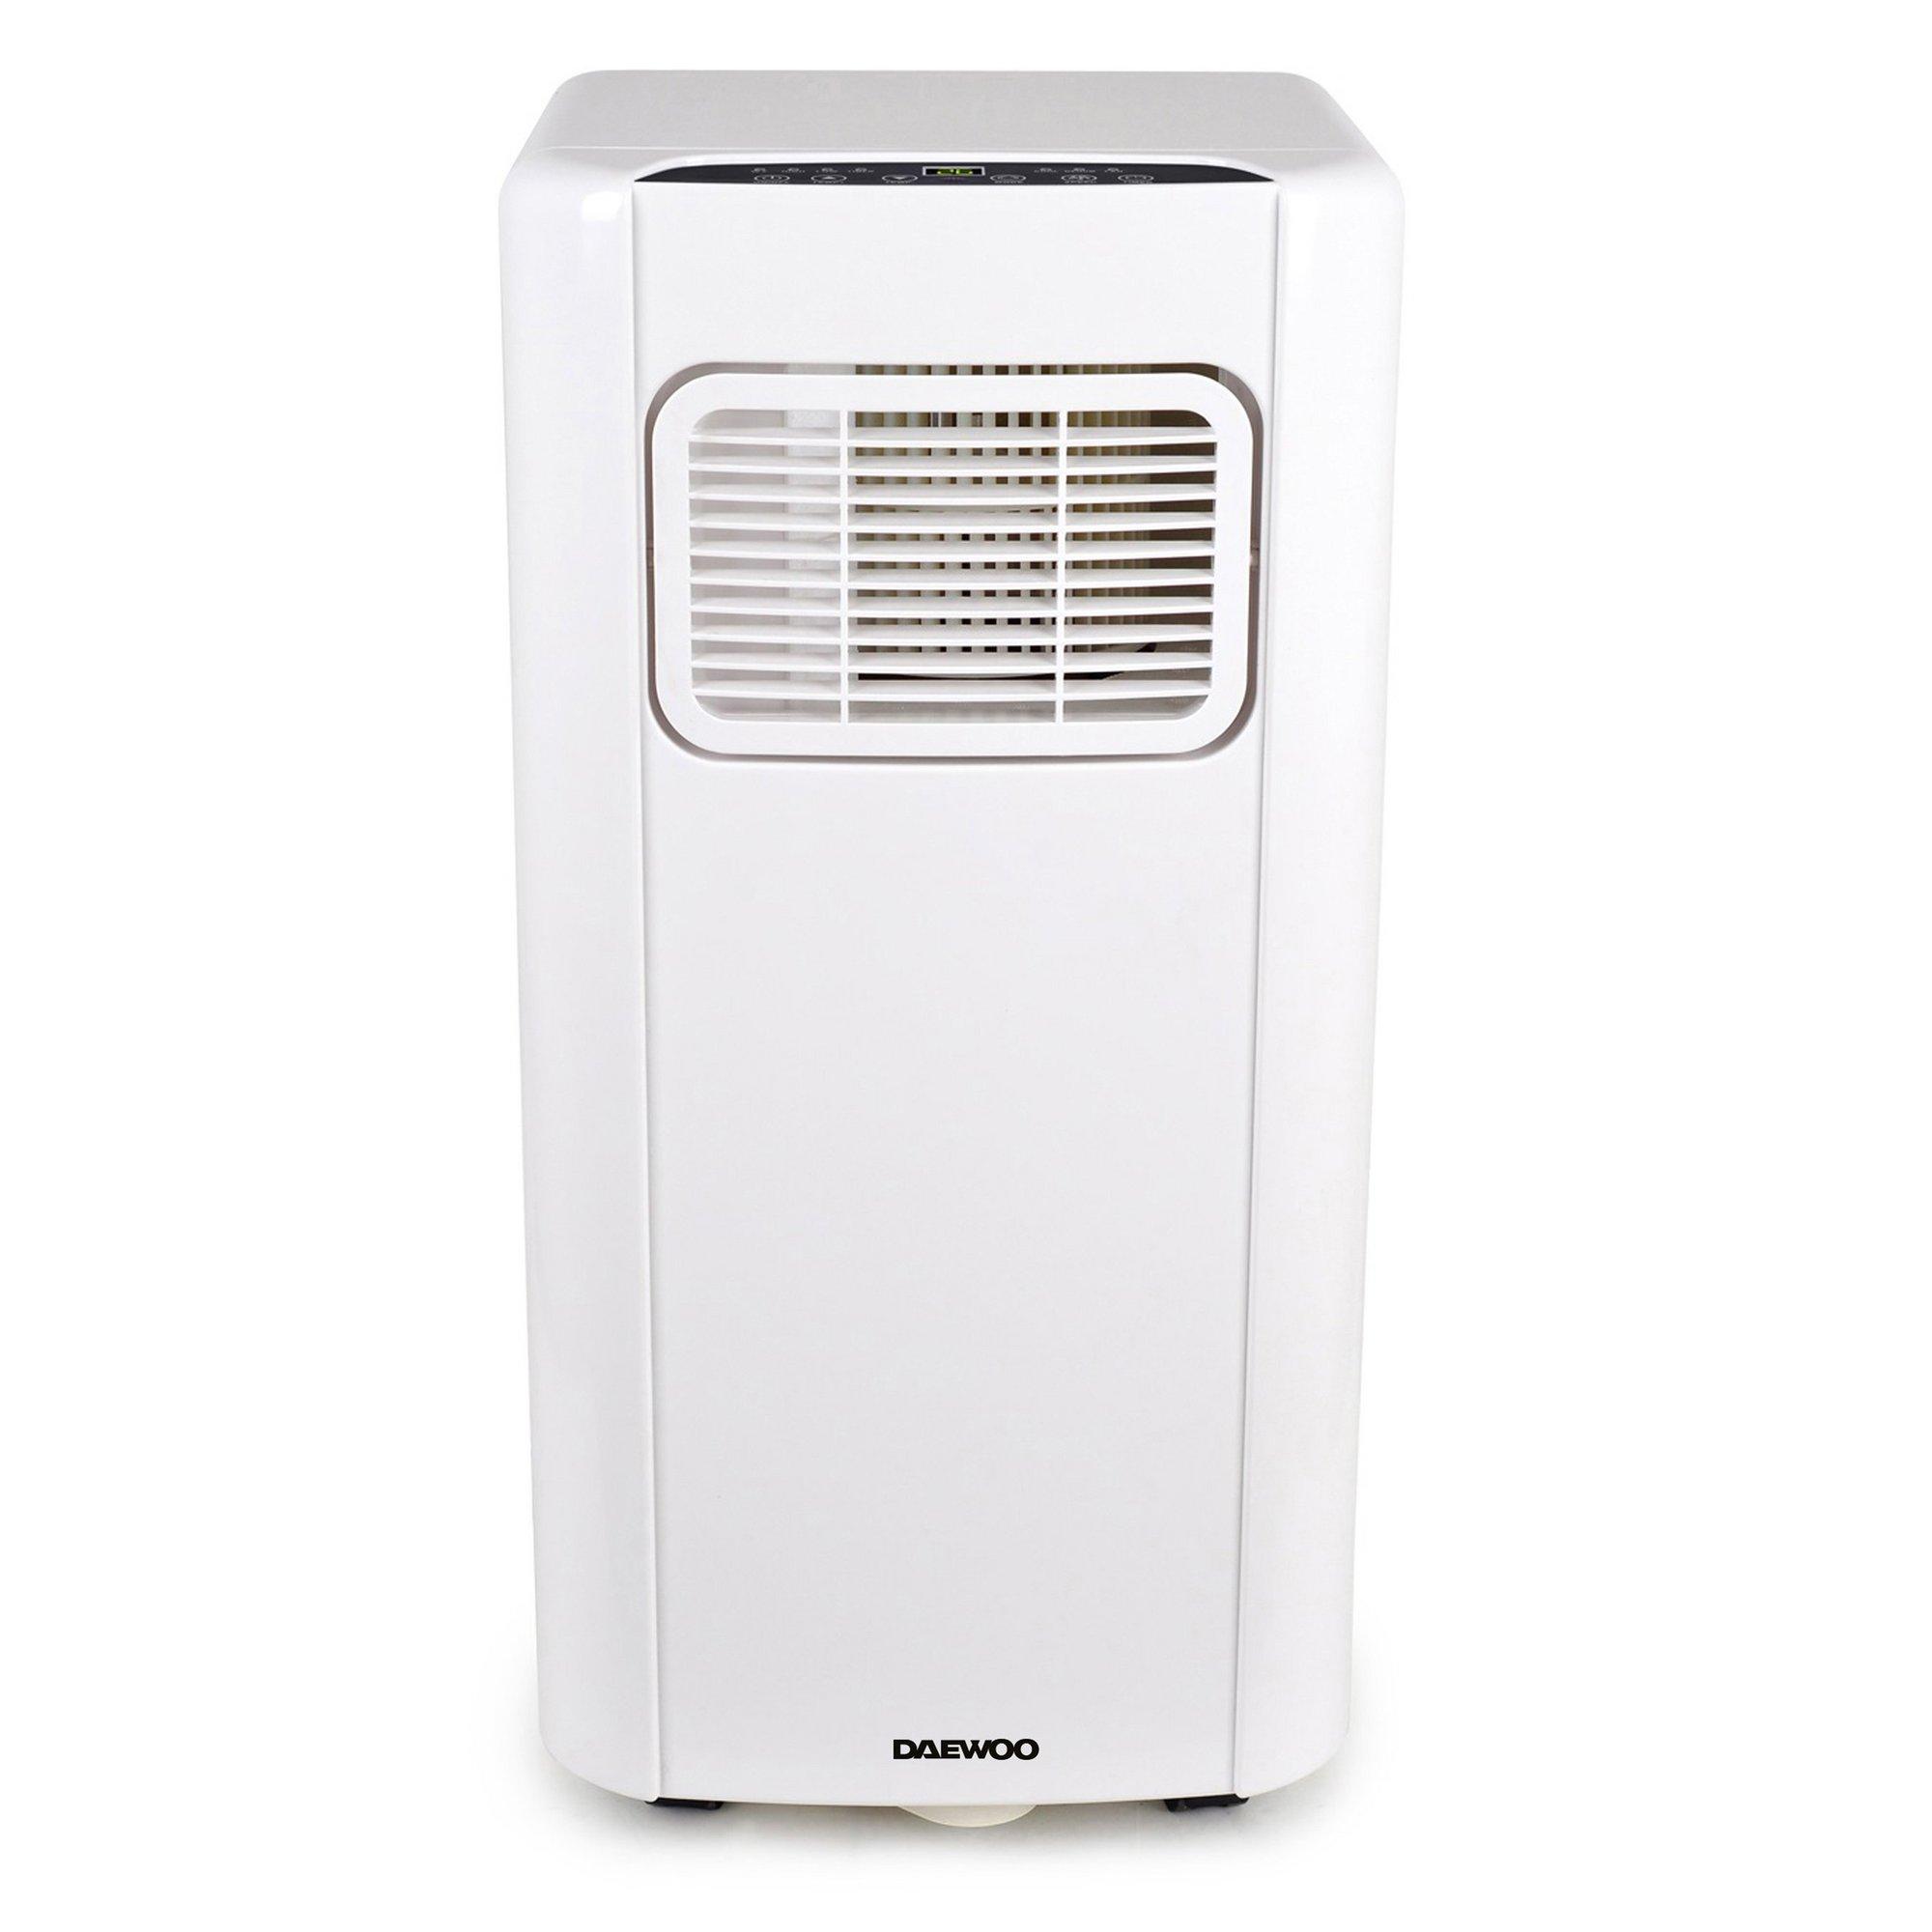 Image of Daewoo 7000 BTU Portable Air Conditioning Unit